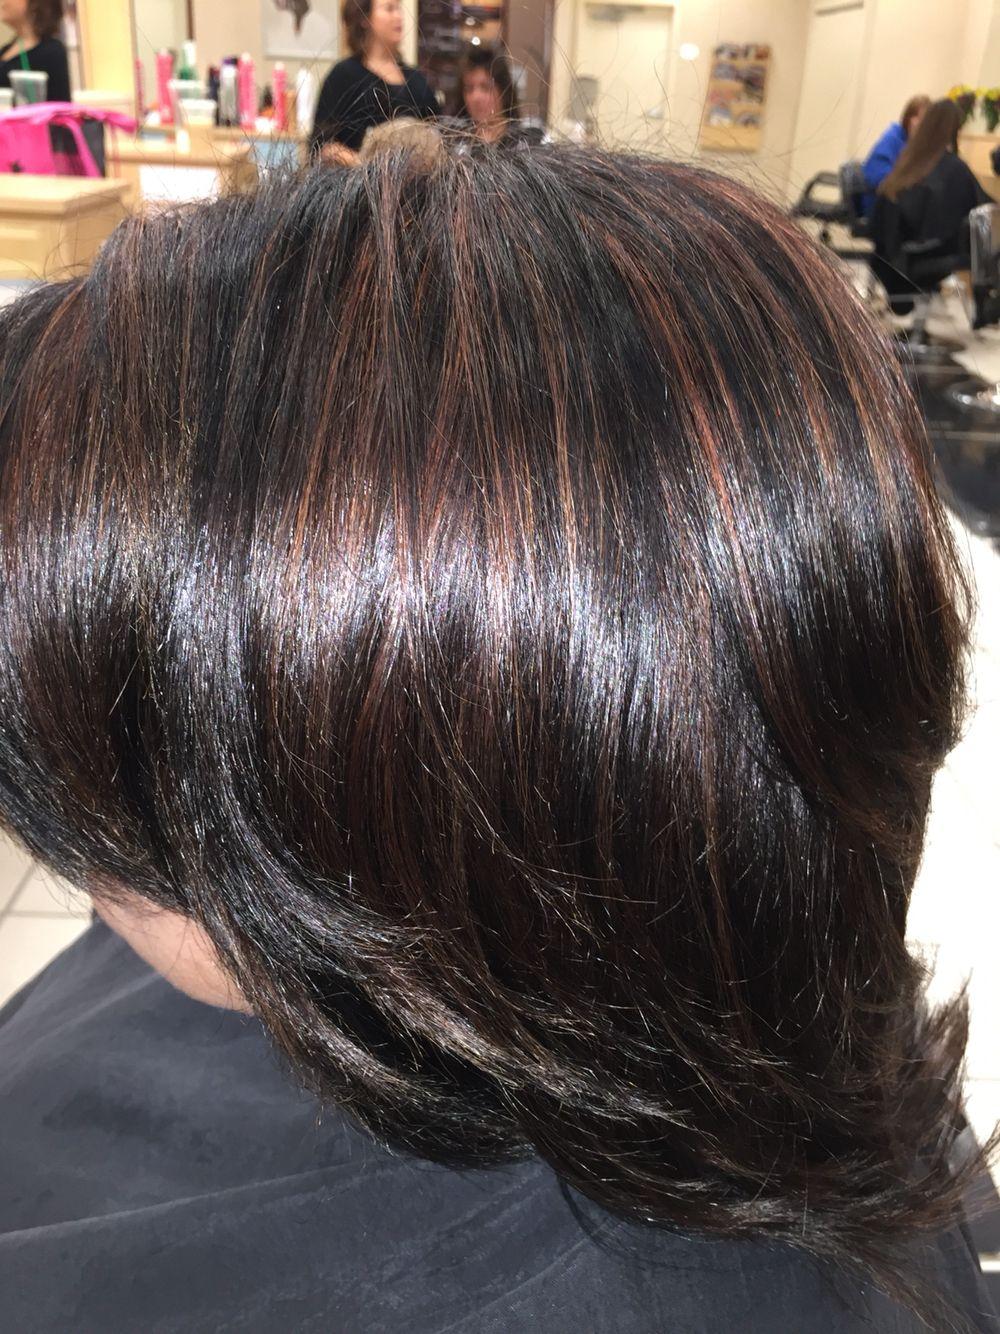 Mocha Highlights On Dark Brown Hair Great For Fall